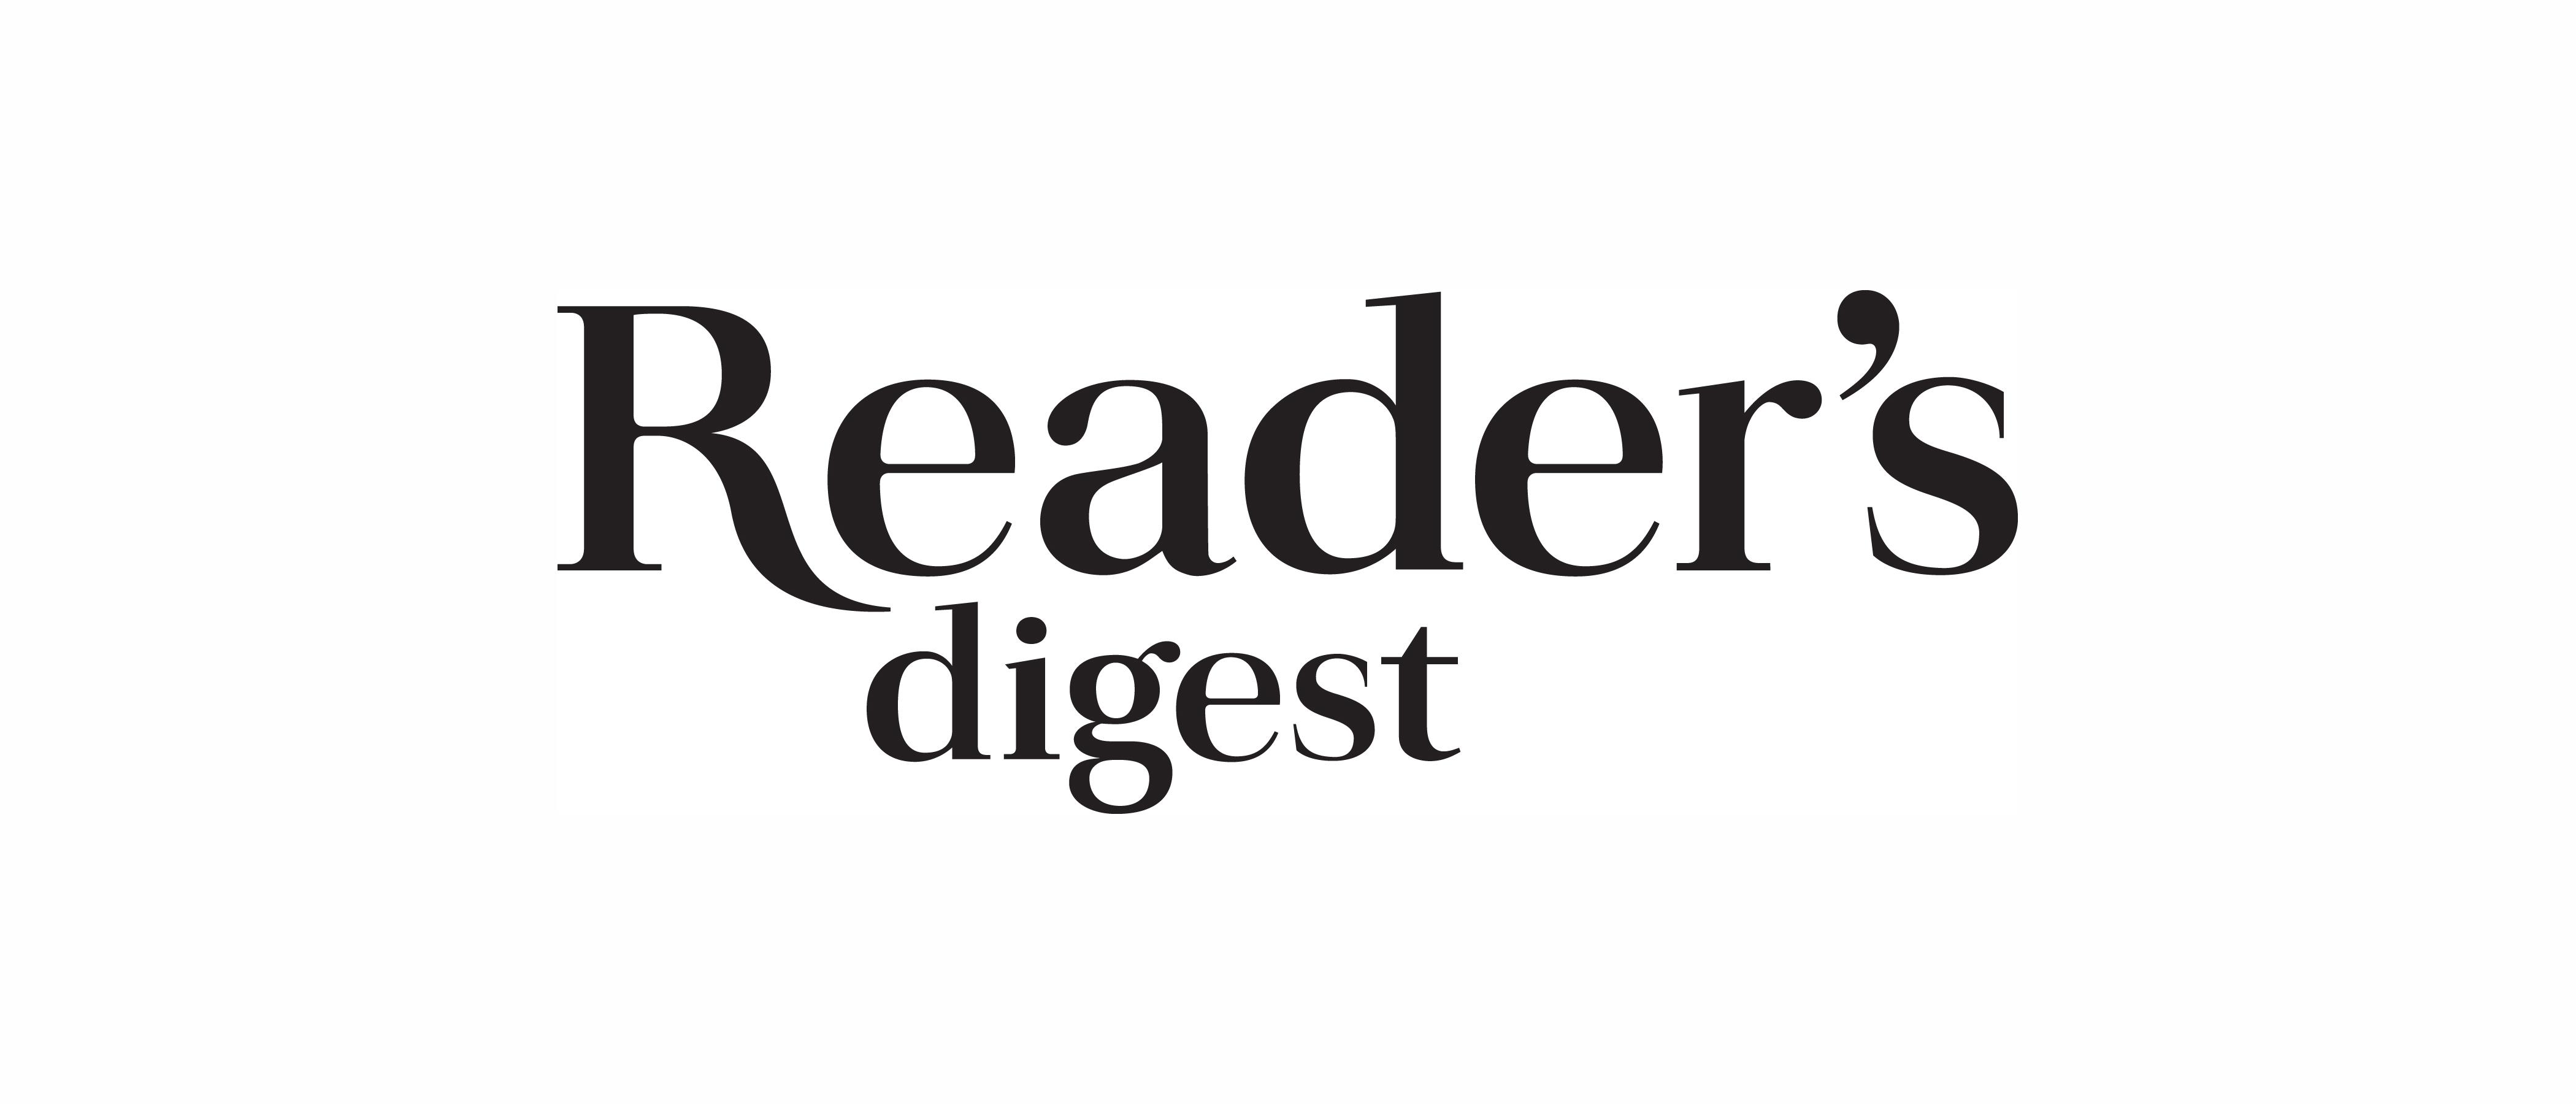 Alexes-Hazen-MD-Readers-Digest-Media-Art